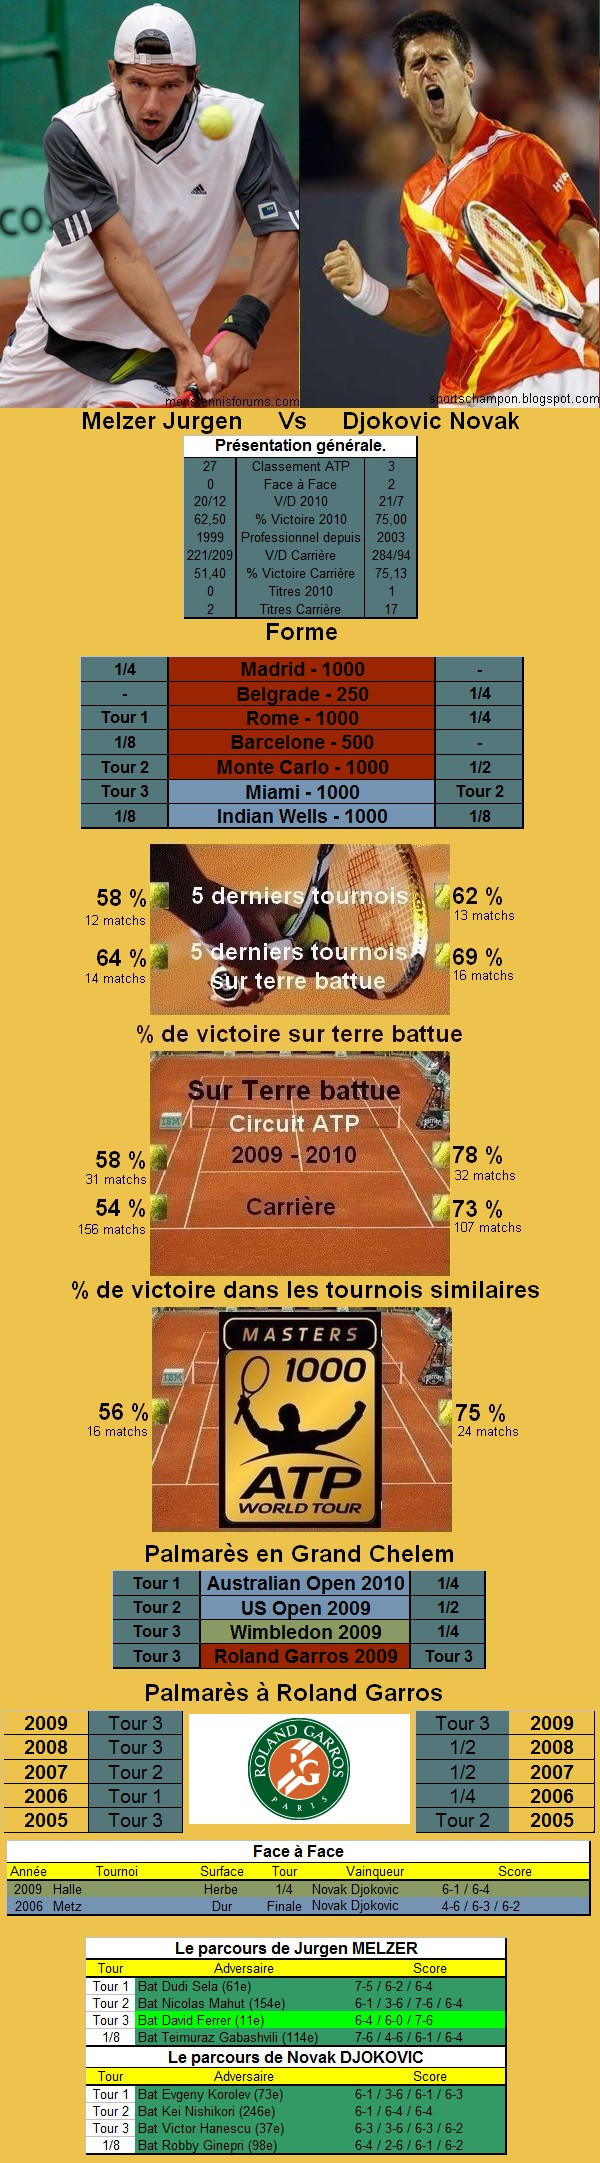 Statistiques tennis de Melzer contre Djokovic à Roland Garros